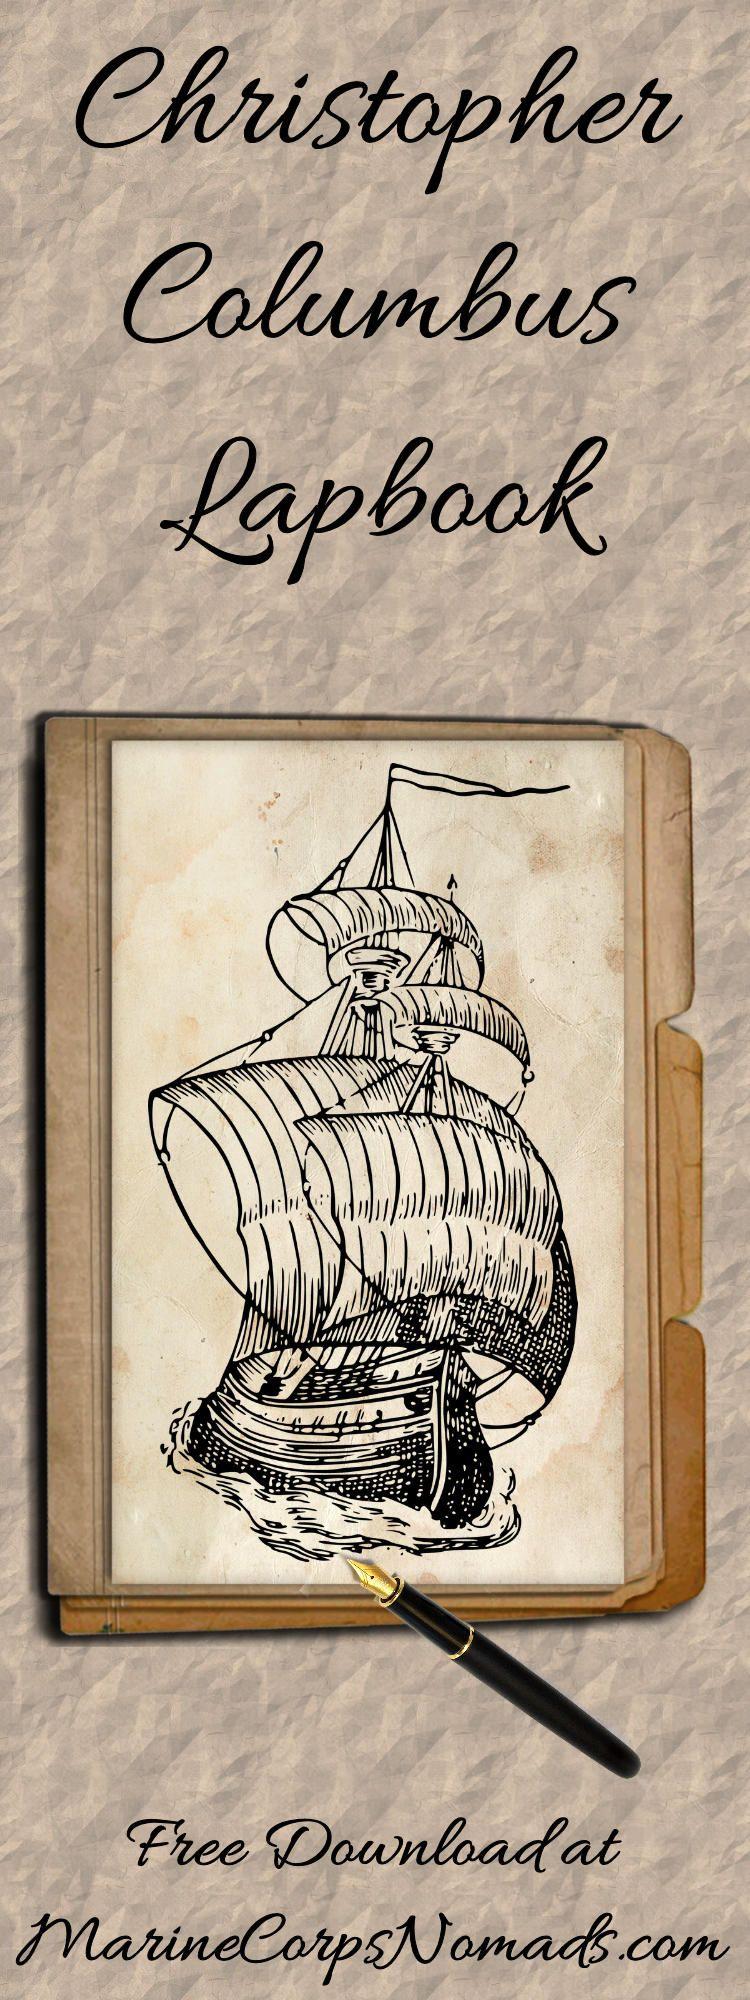 Atractivo Hojas Para Colorear De Christopher Columbus Viñeta - Ideas ...